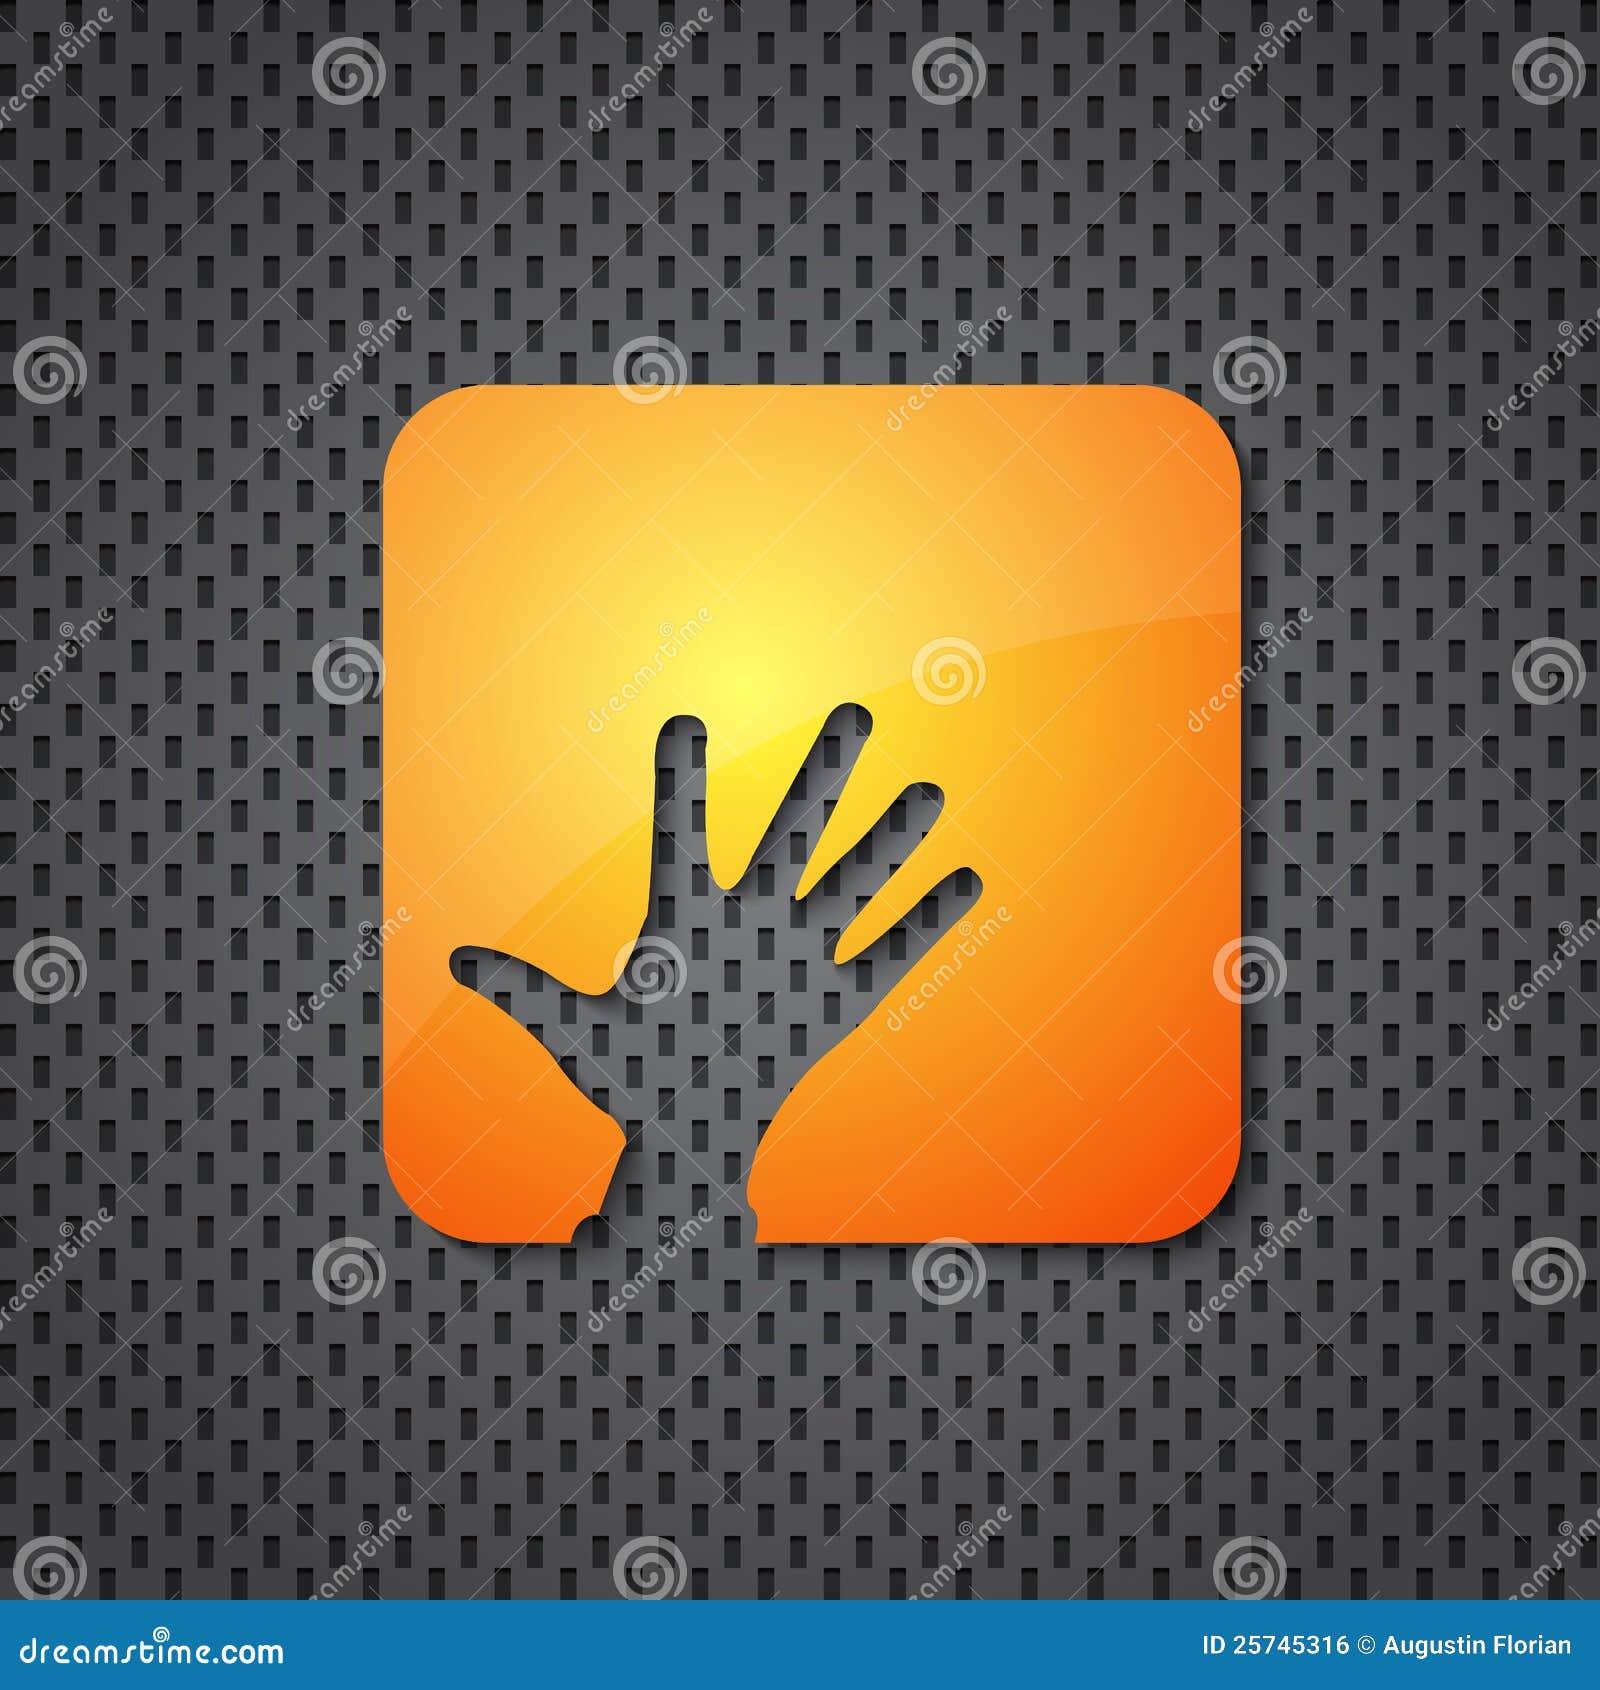 Helping hand orange icon